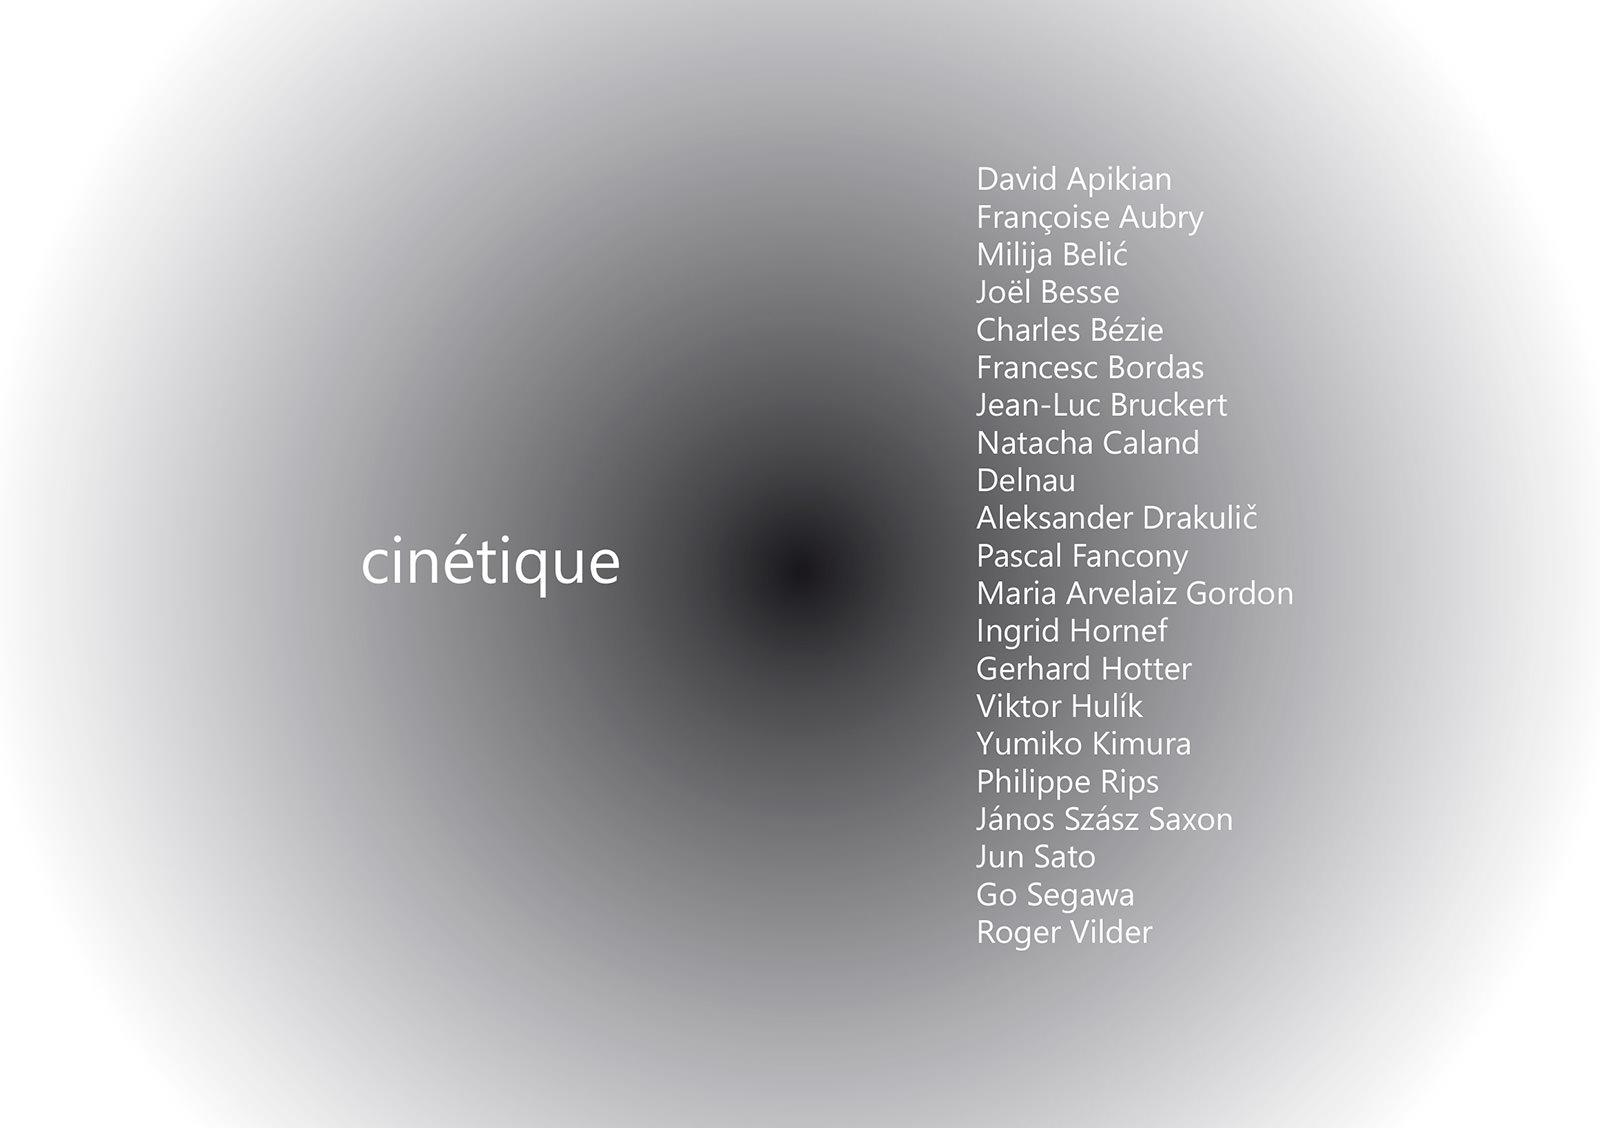 cinetique1_1600